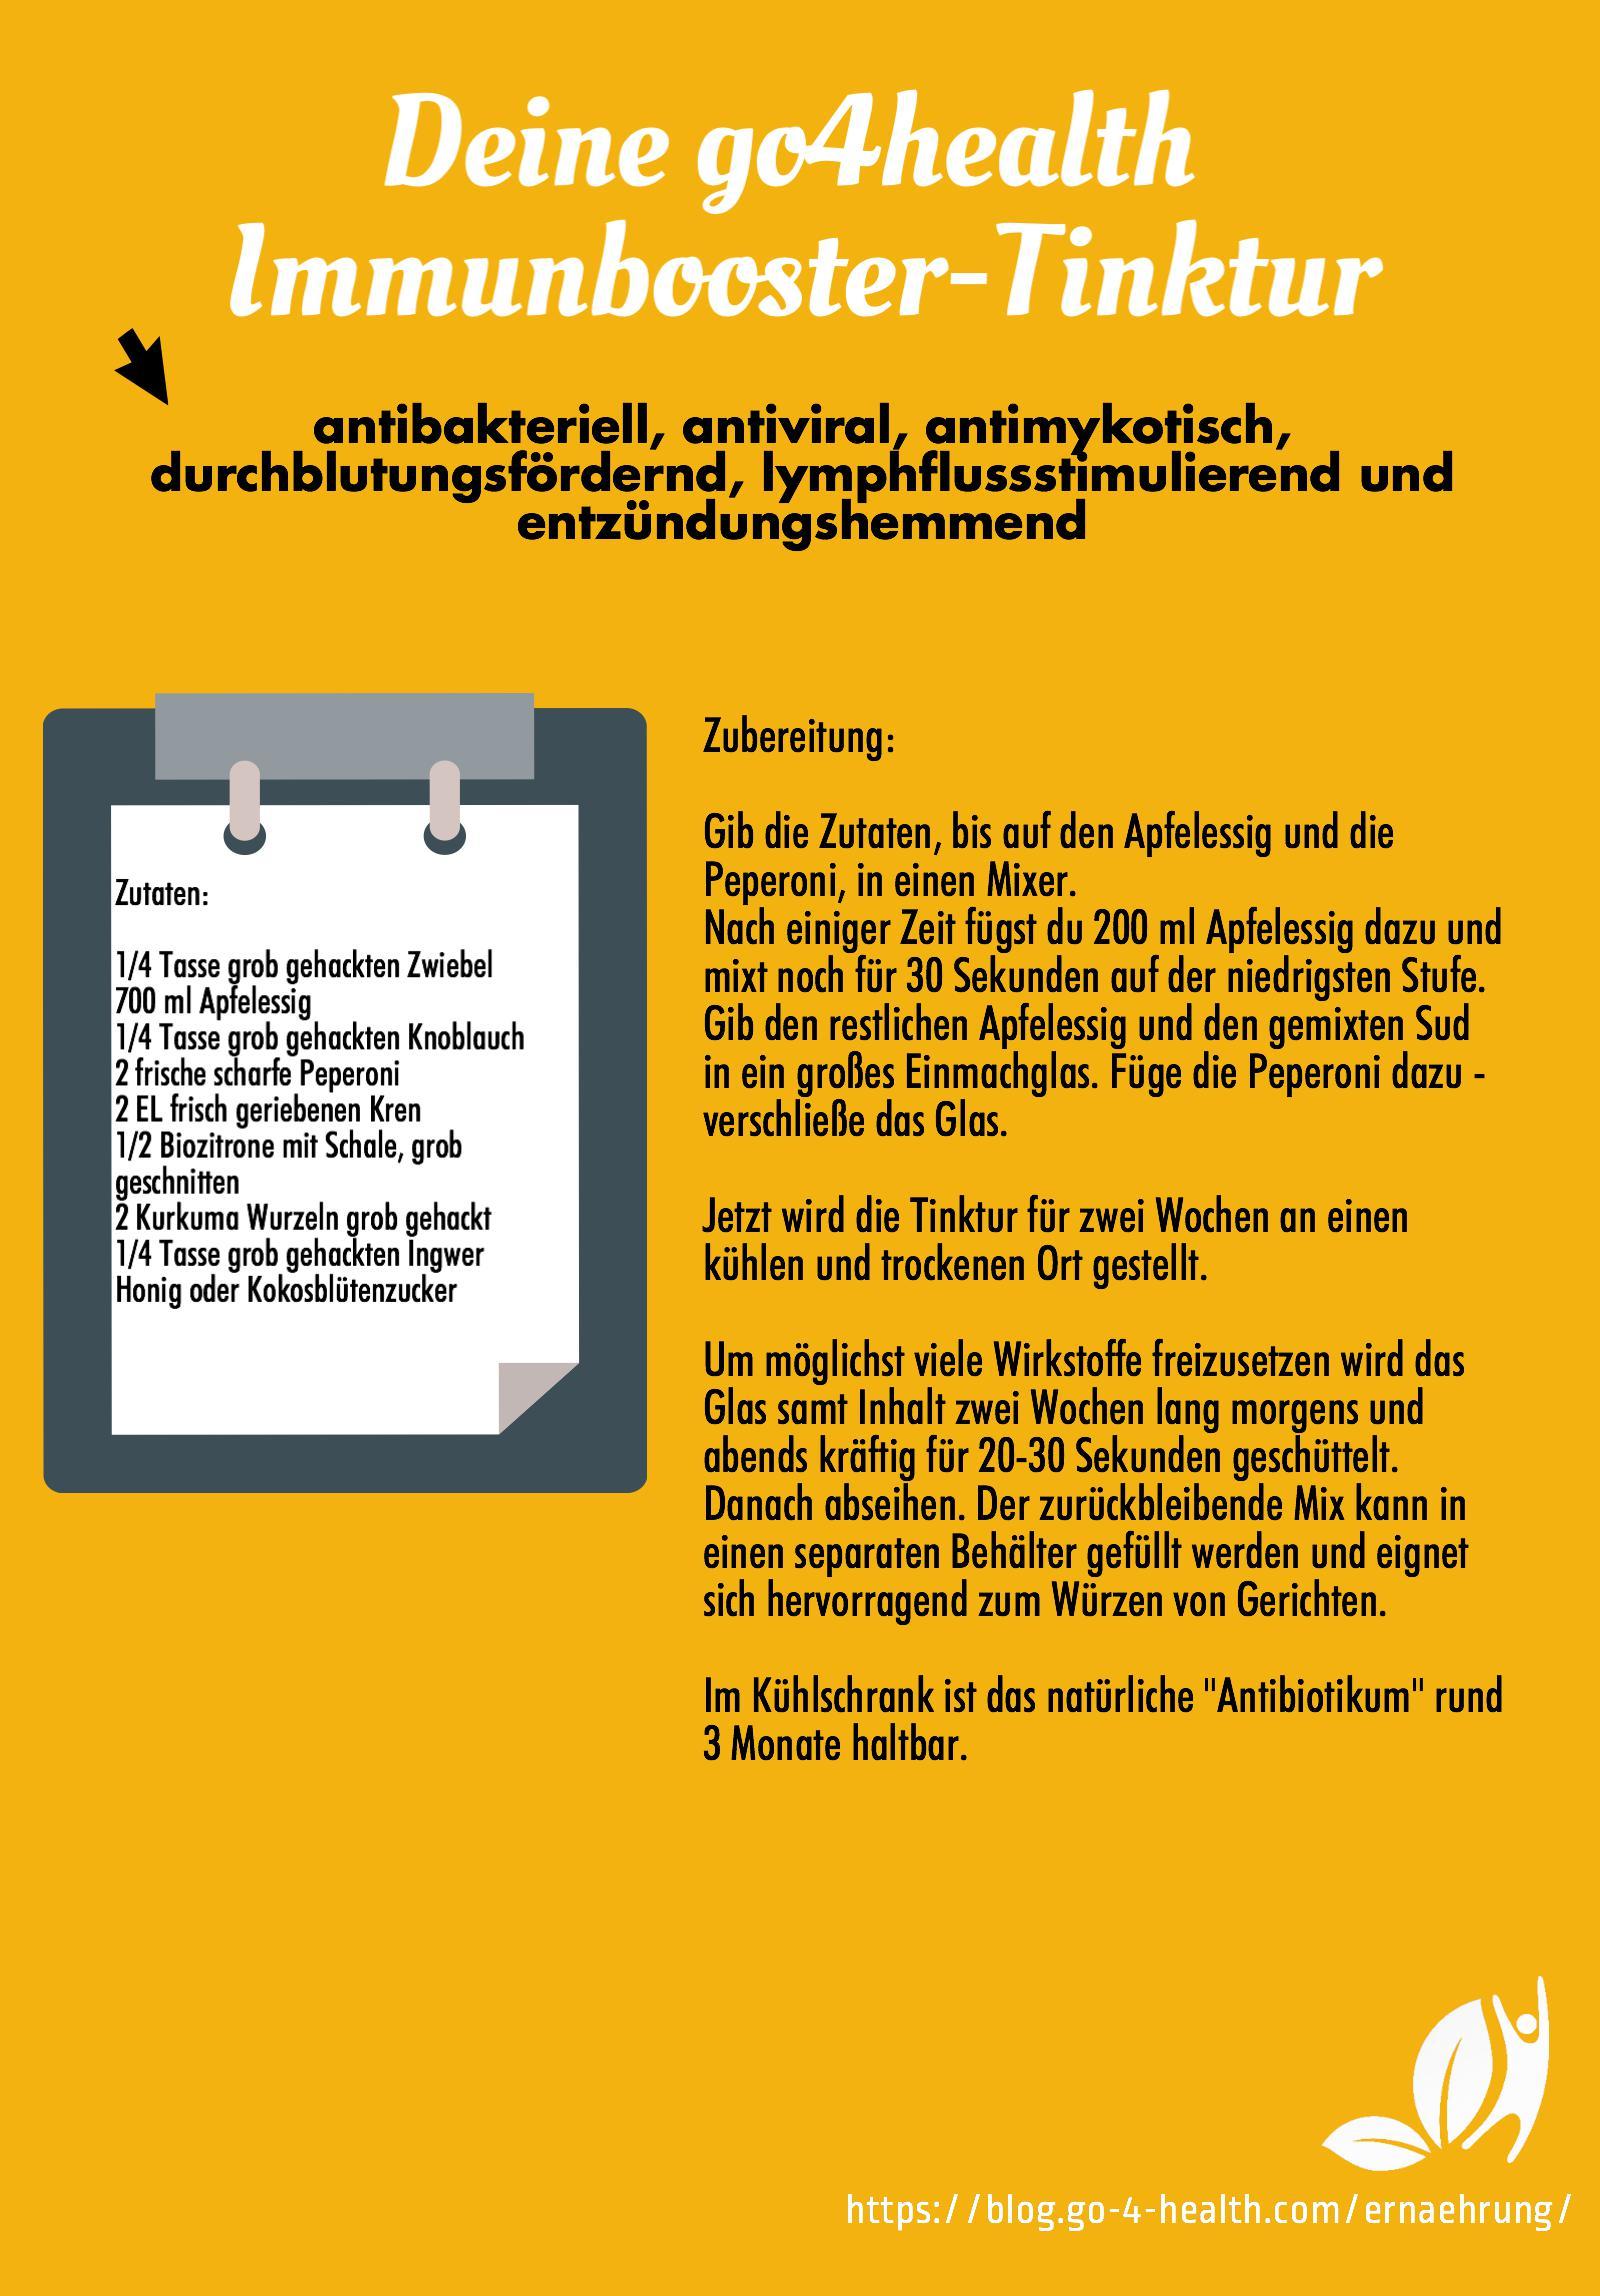 Die go4health Immunbooster-Tinktur